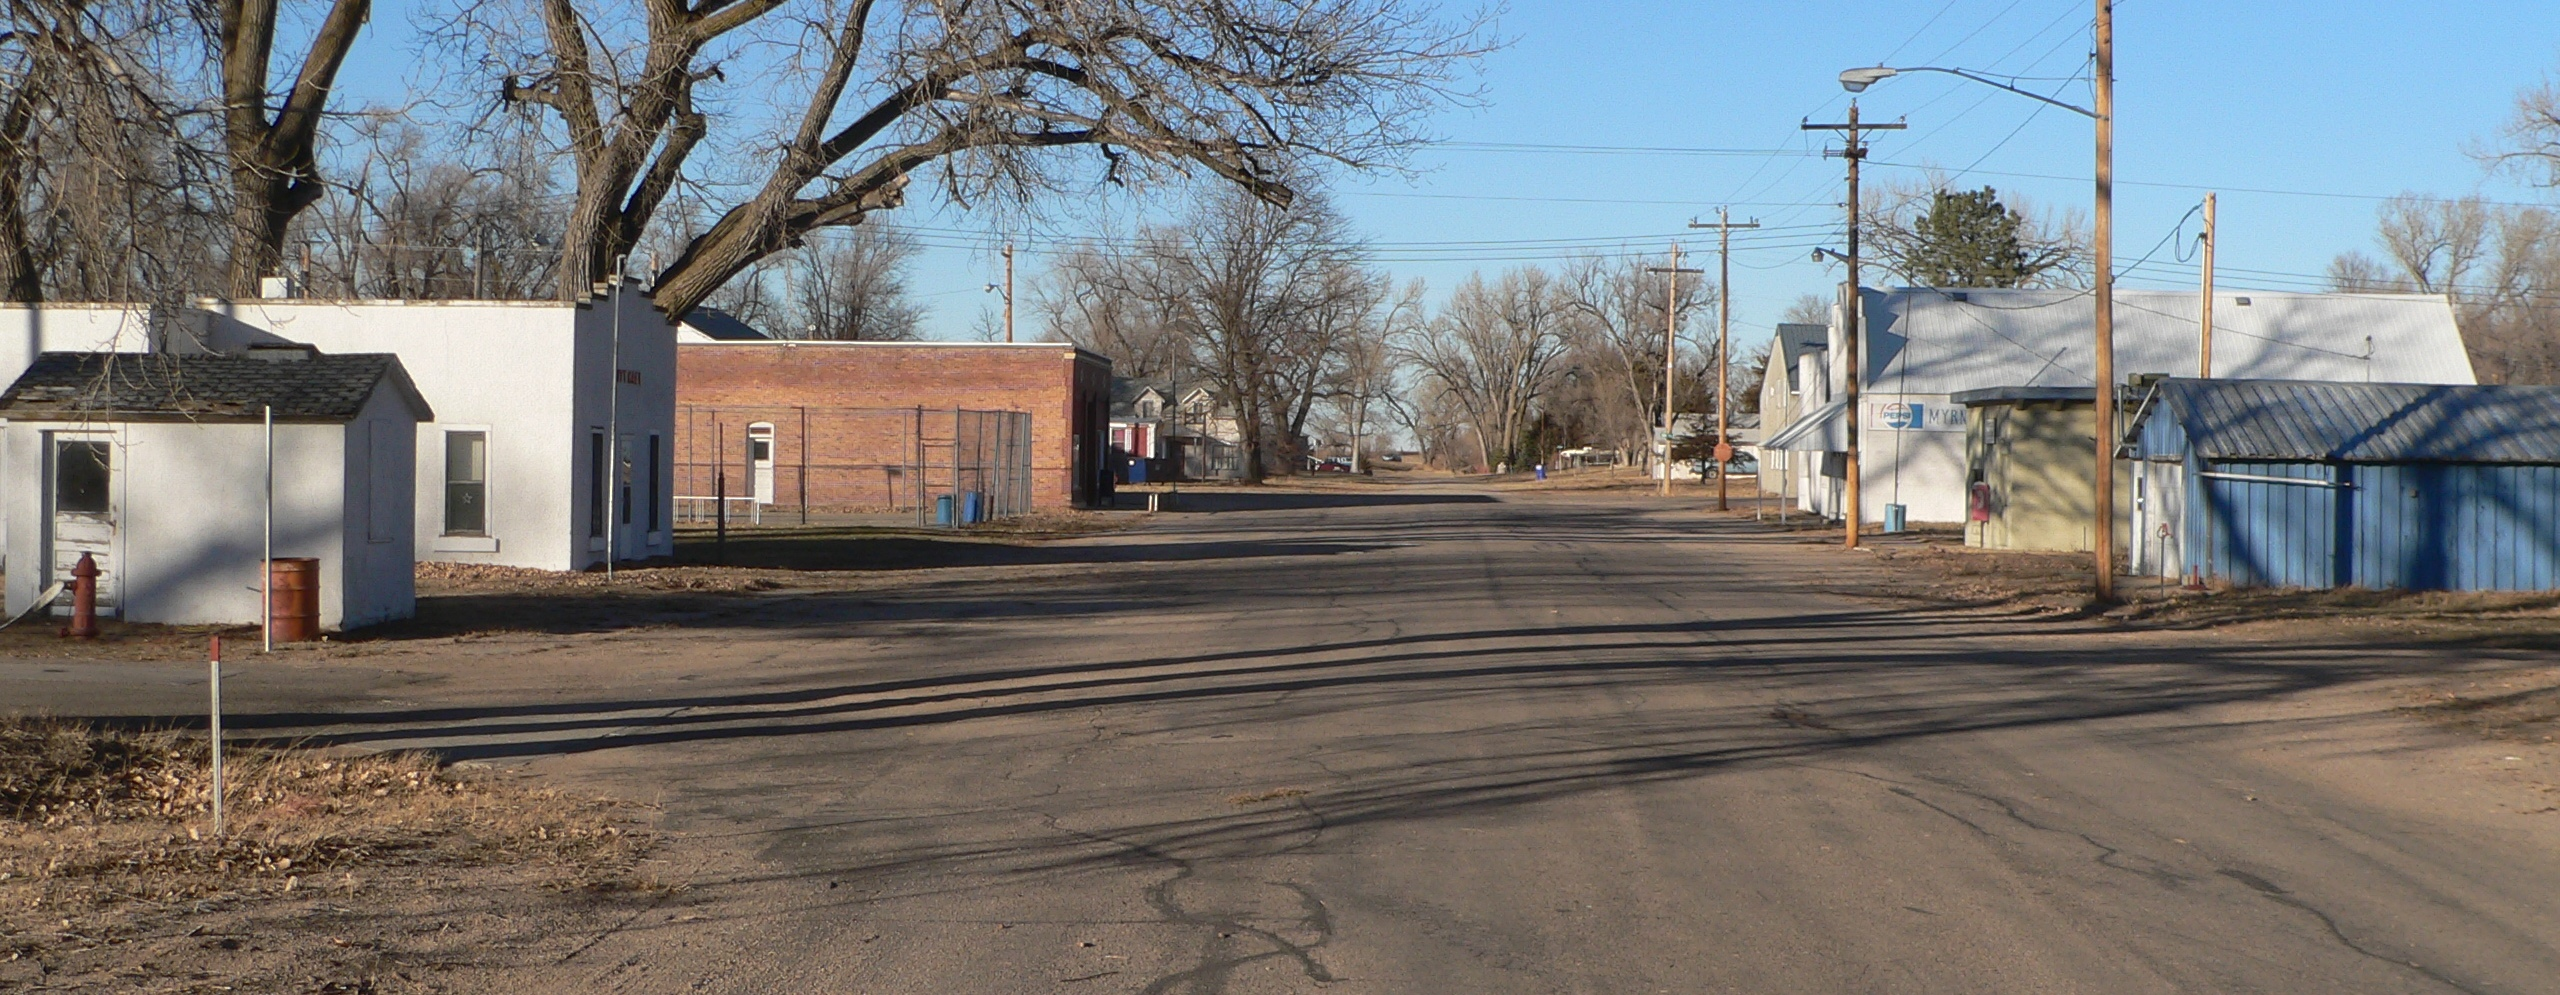 Newport Funeral Homes, funeral services & flowers in Nebraska